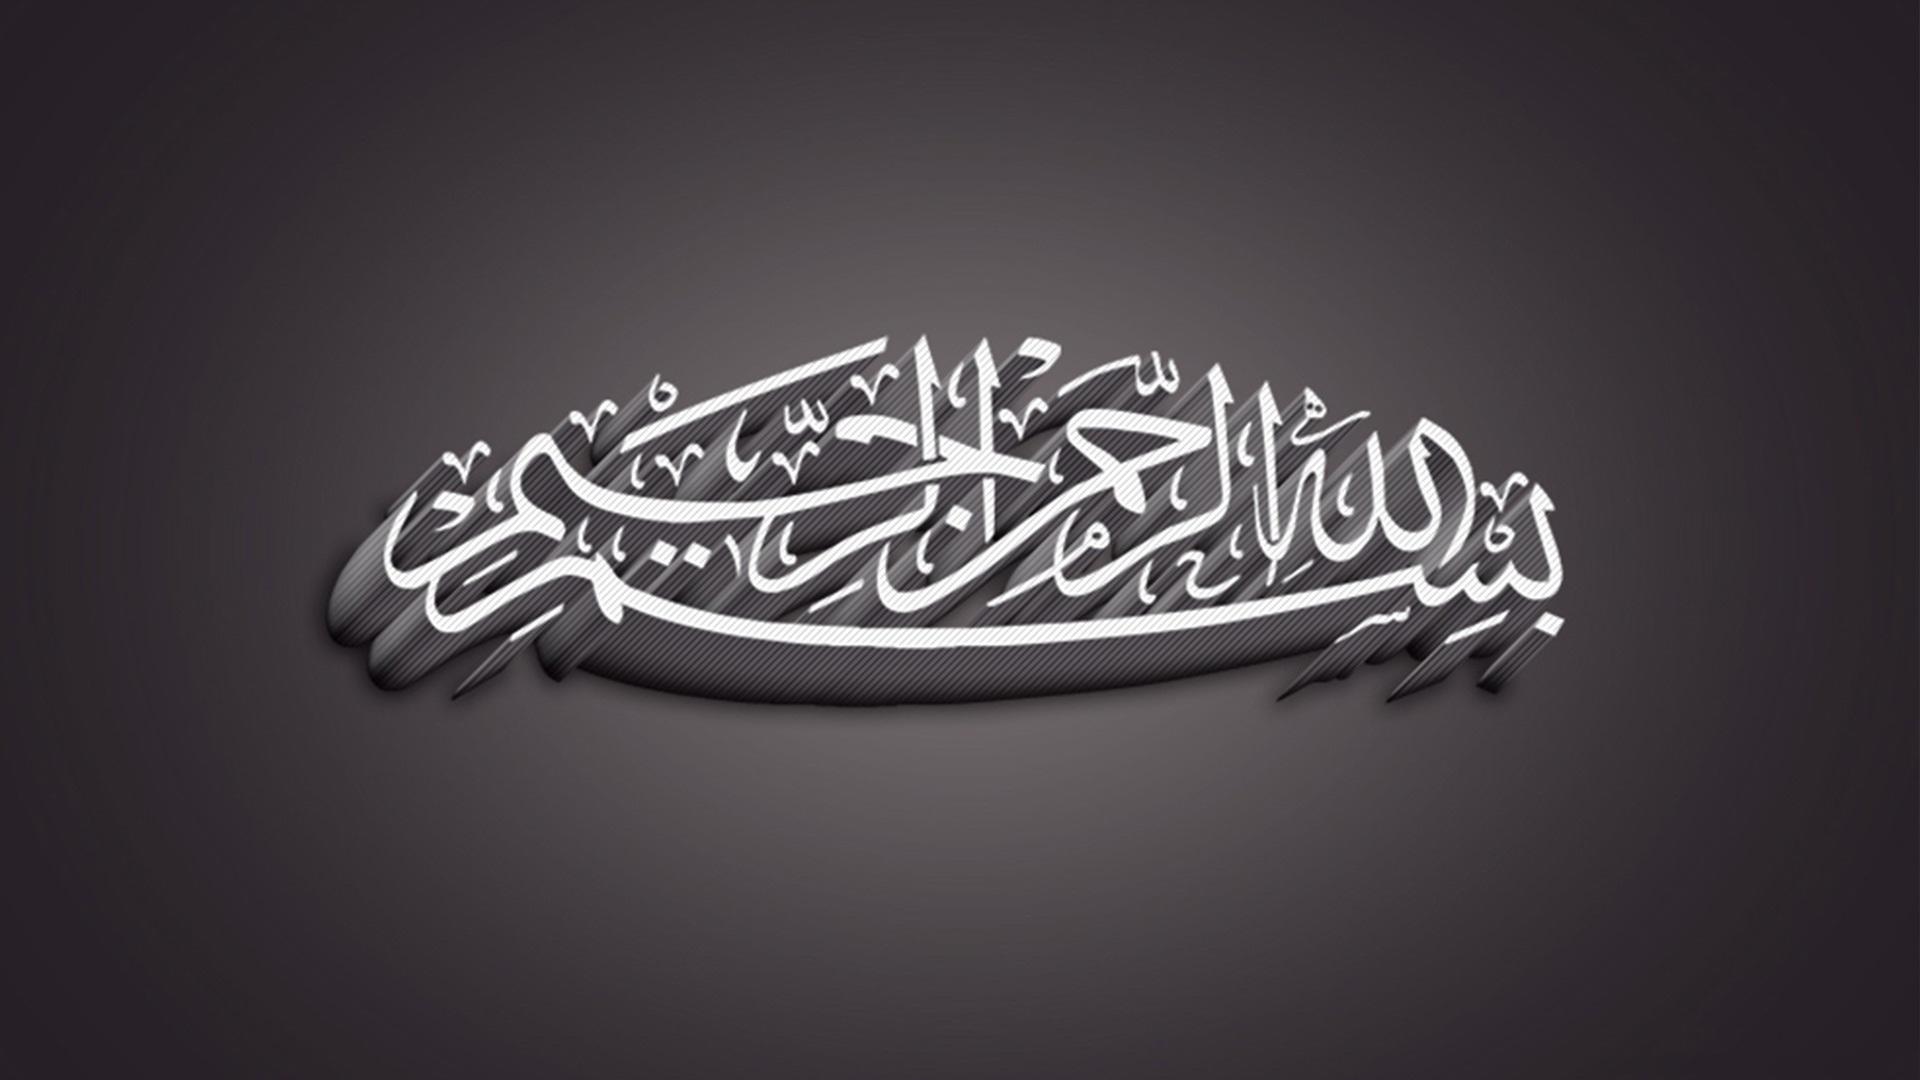 Bismillah Wallpaper, Best Islamic Wallpaper Hd, #26562